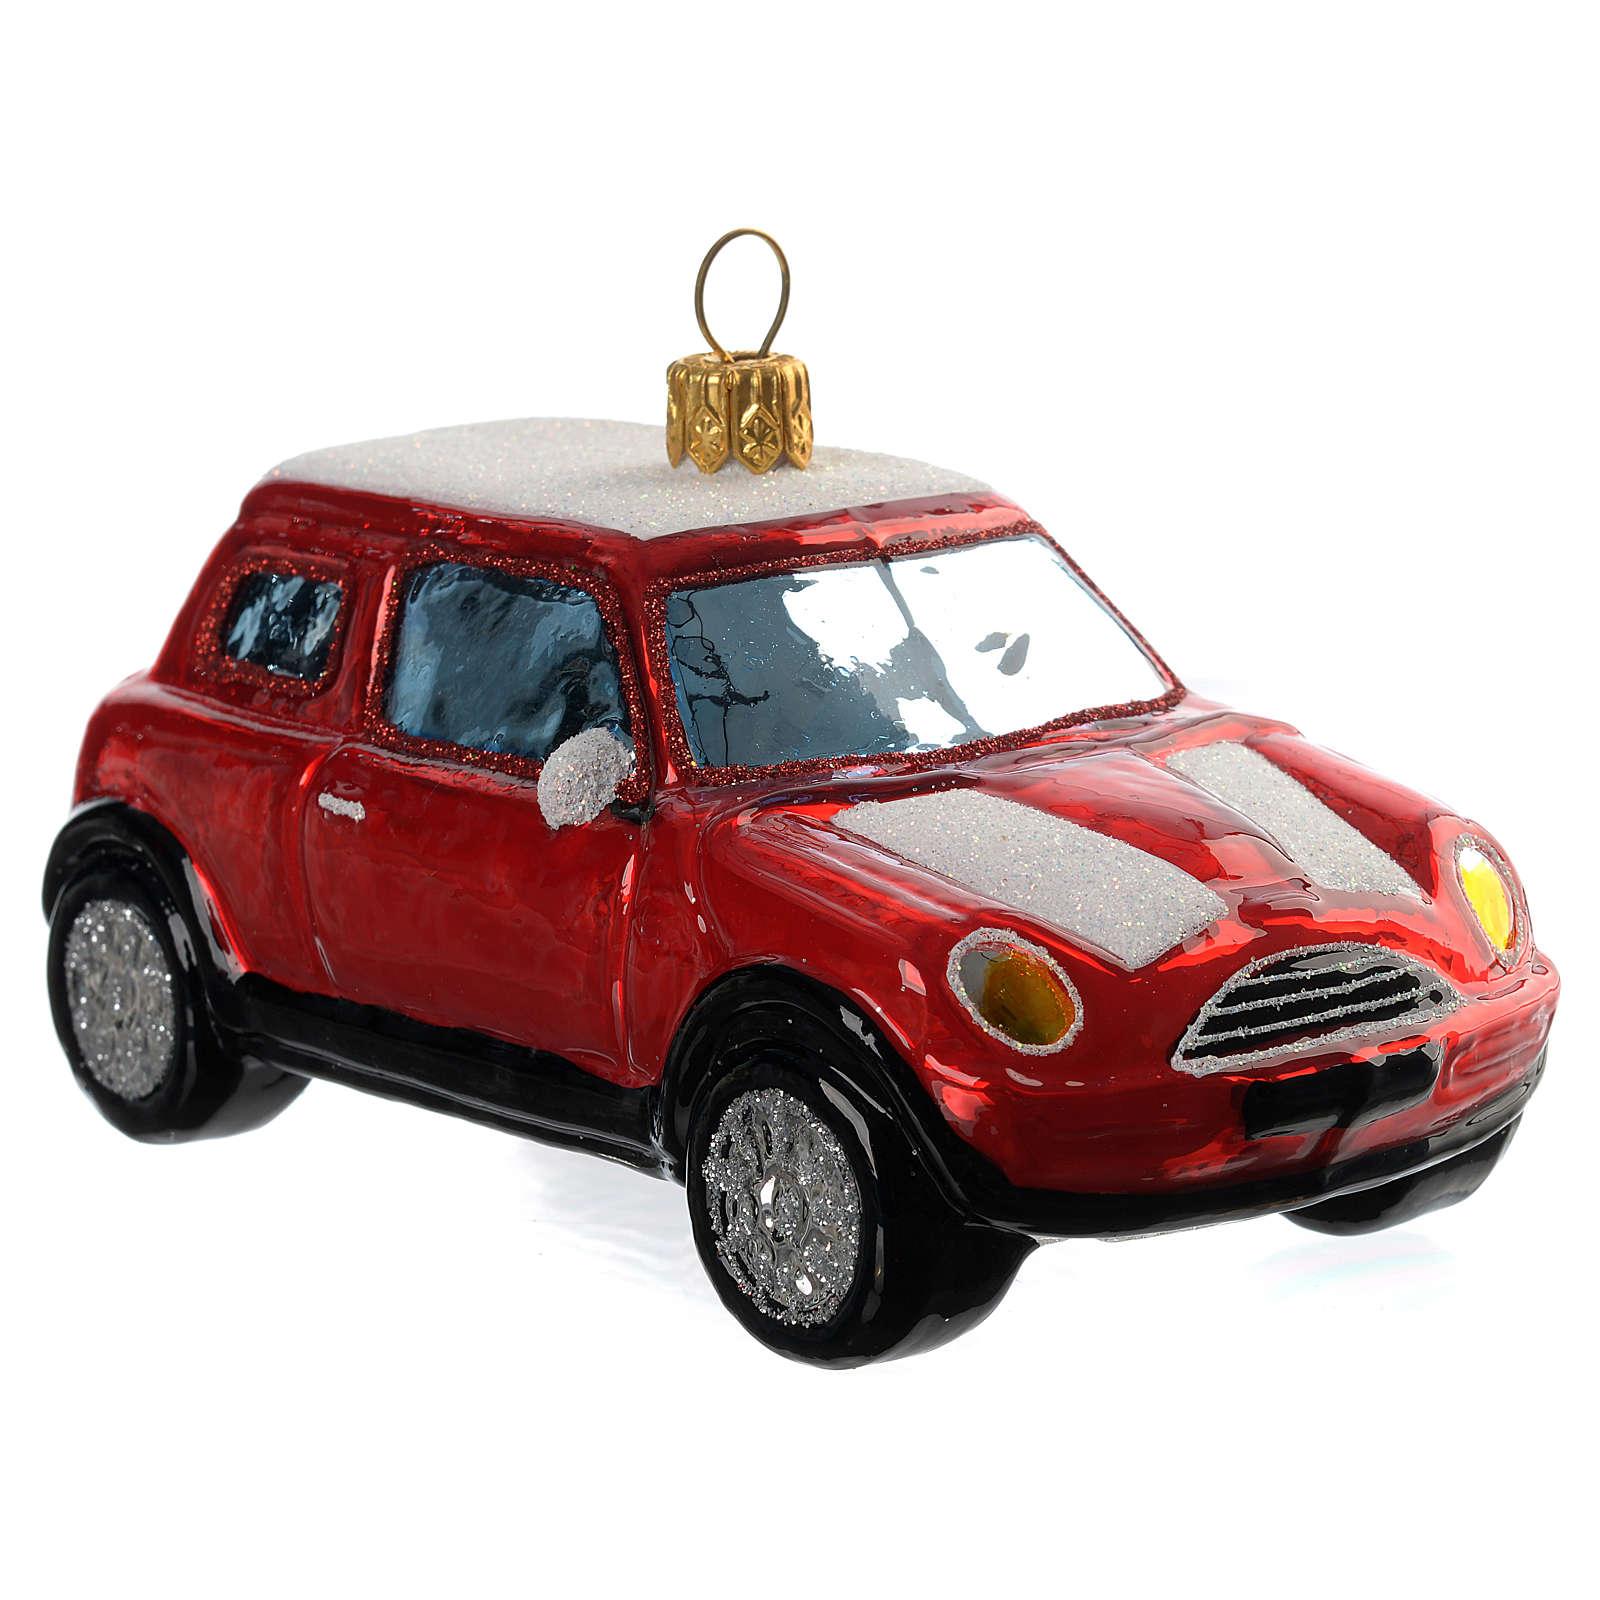 Blown glass Christmas ornament, red Mini Cooper 4